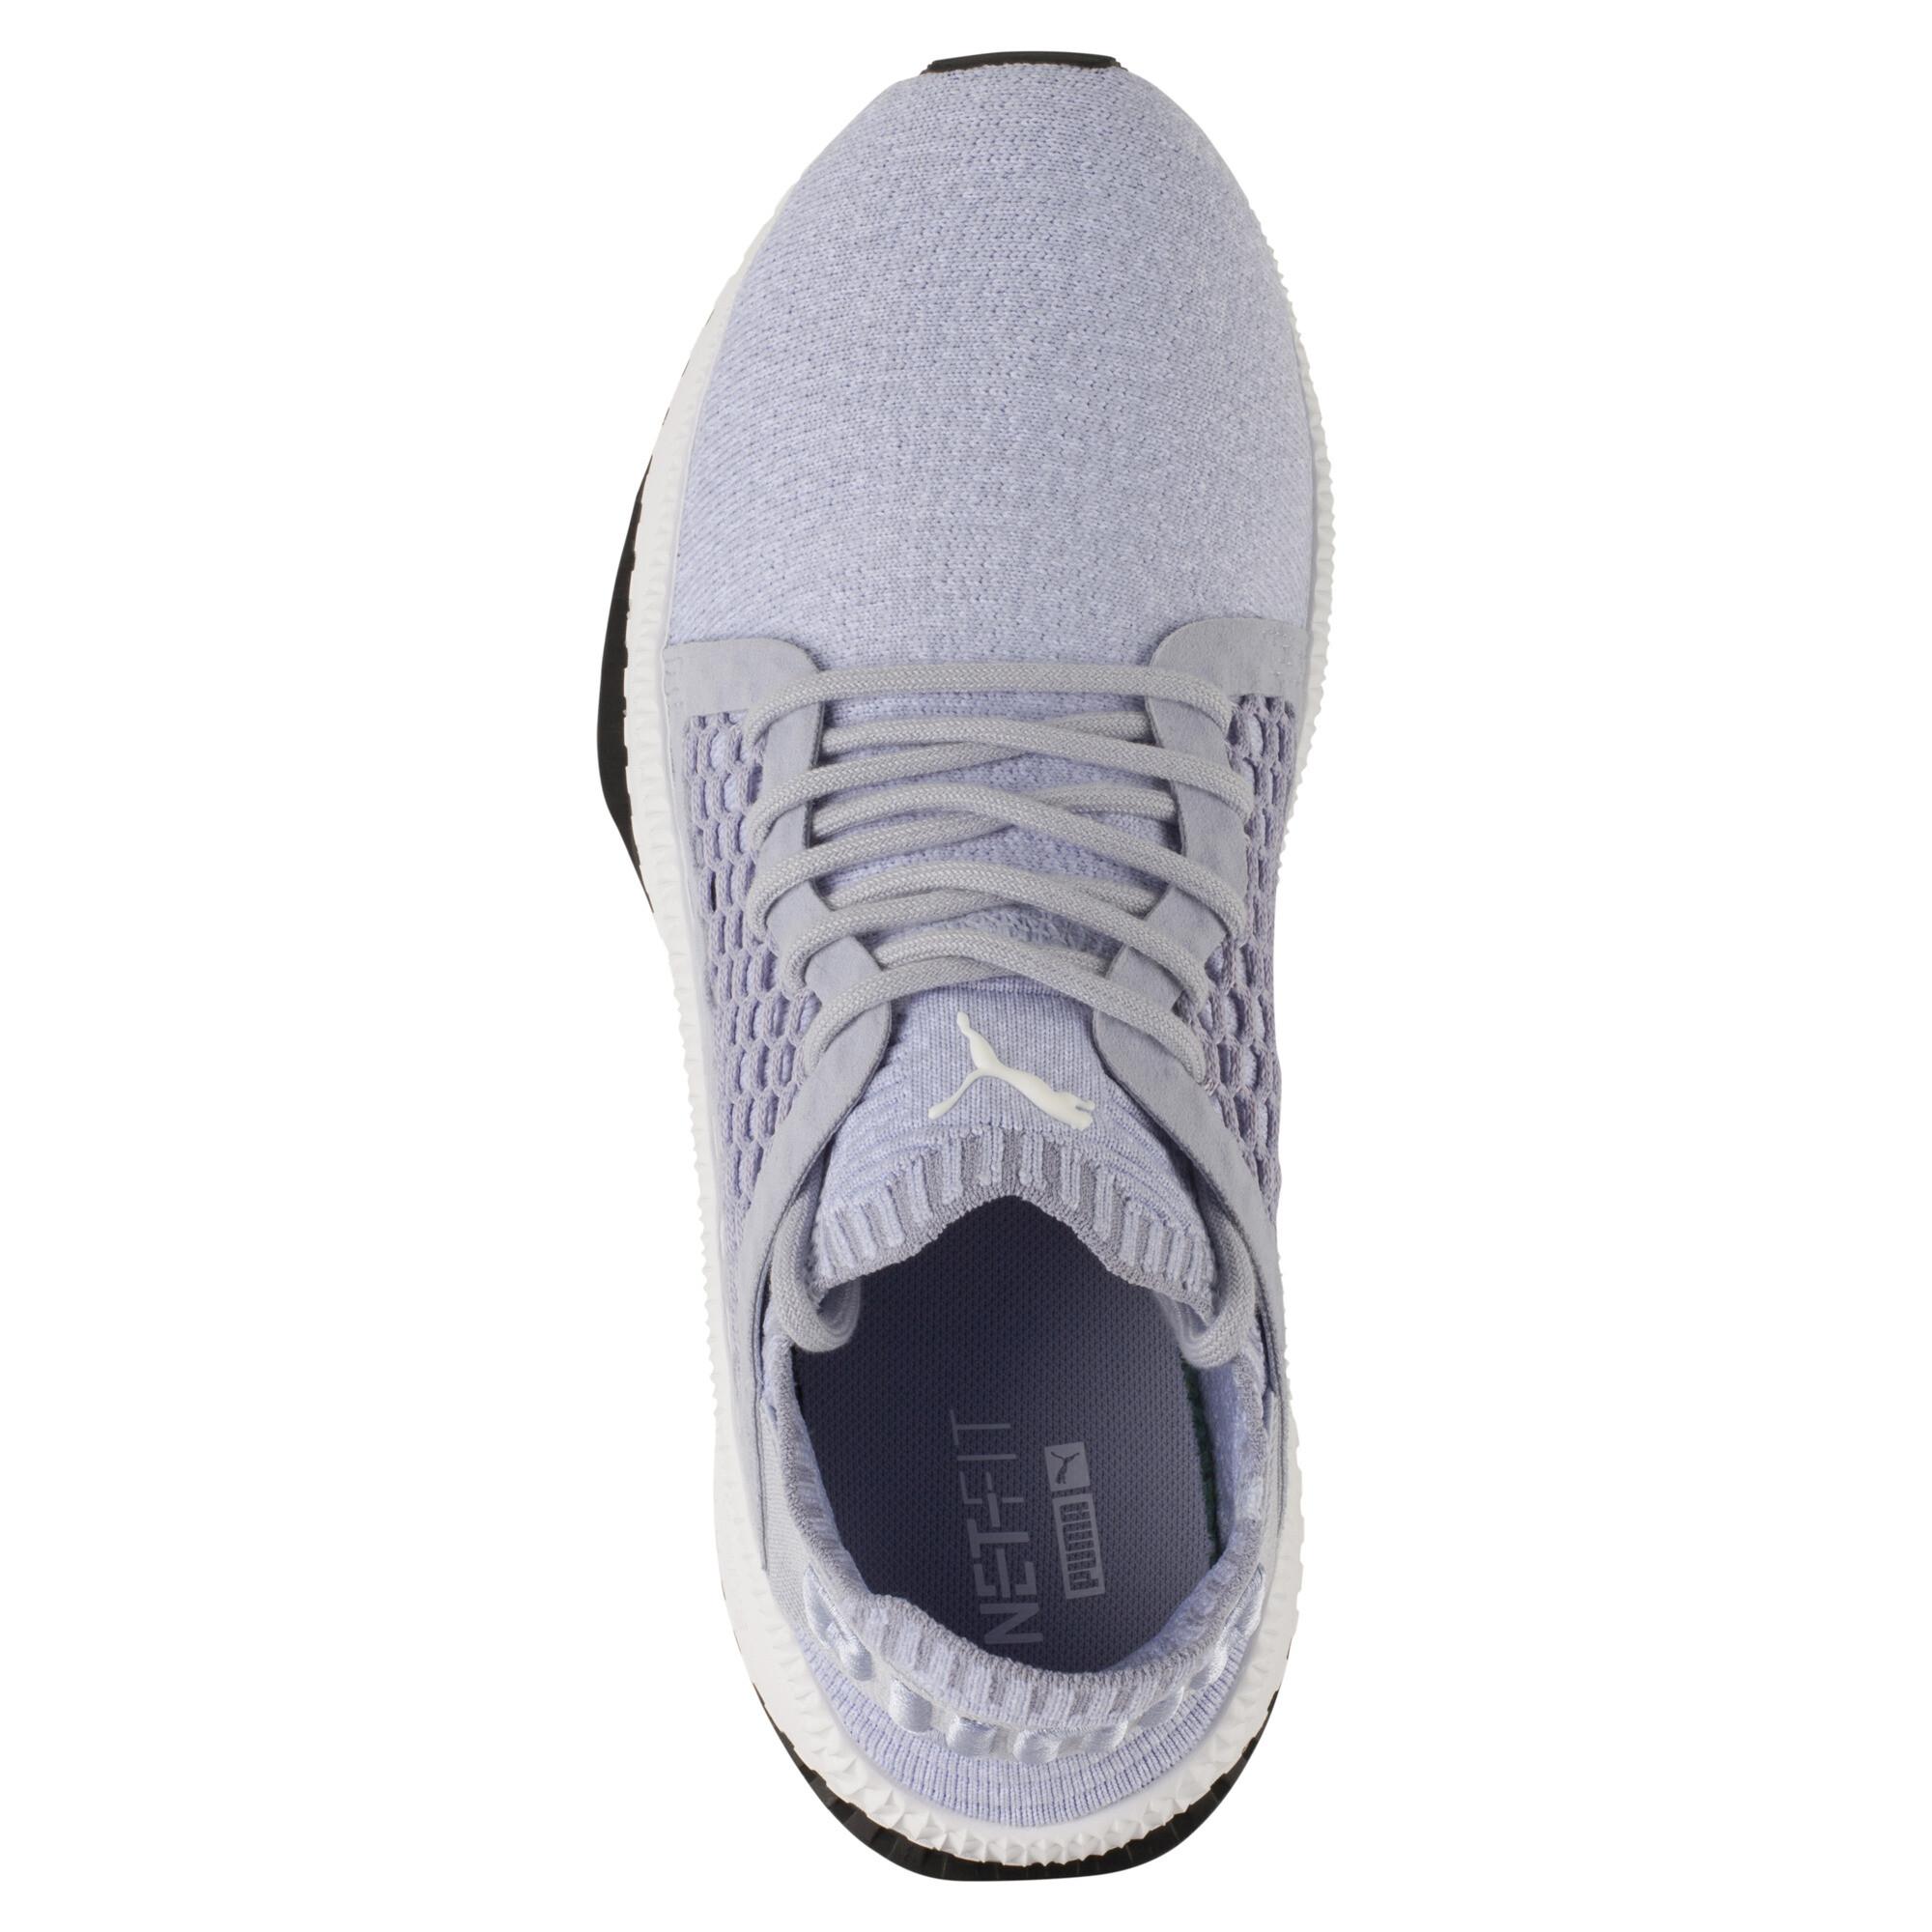 PUMA-TSUGI-NETFIT-evoKNIT-Sneaker-Frauen-Schuhe-Neu Indexbild 11